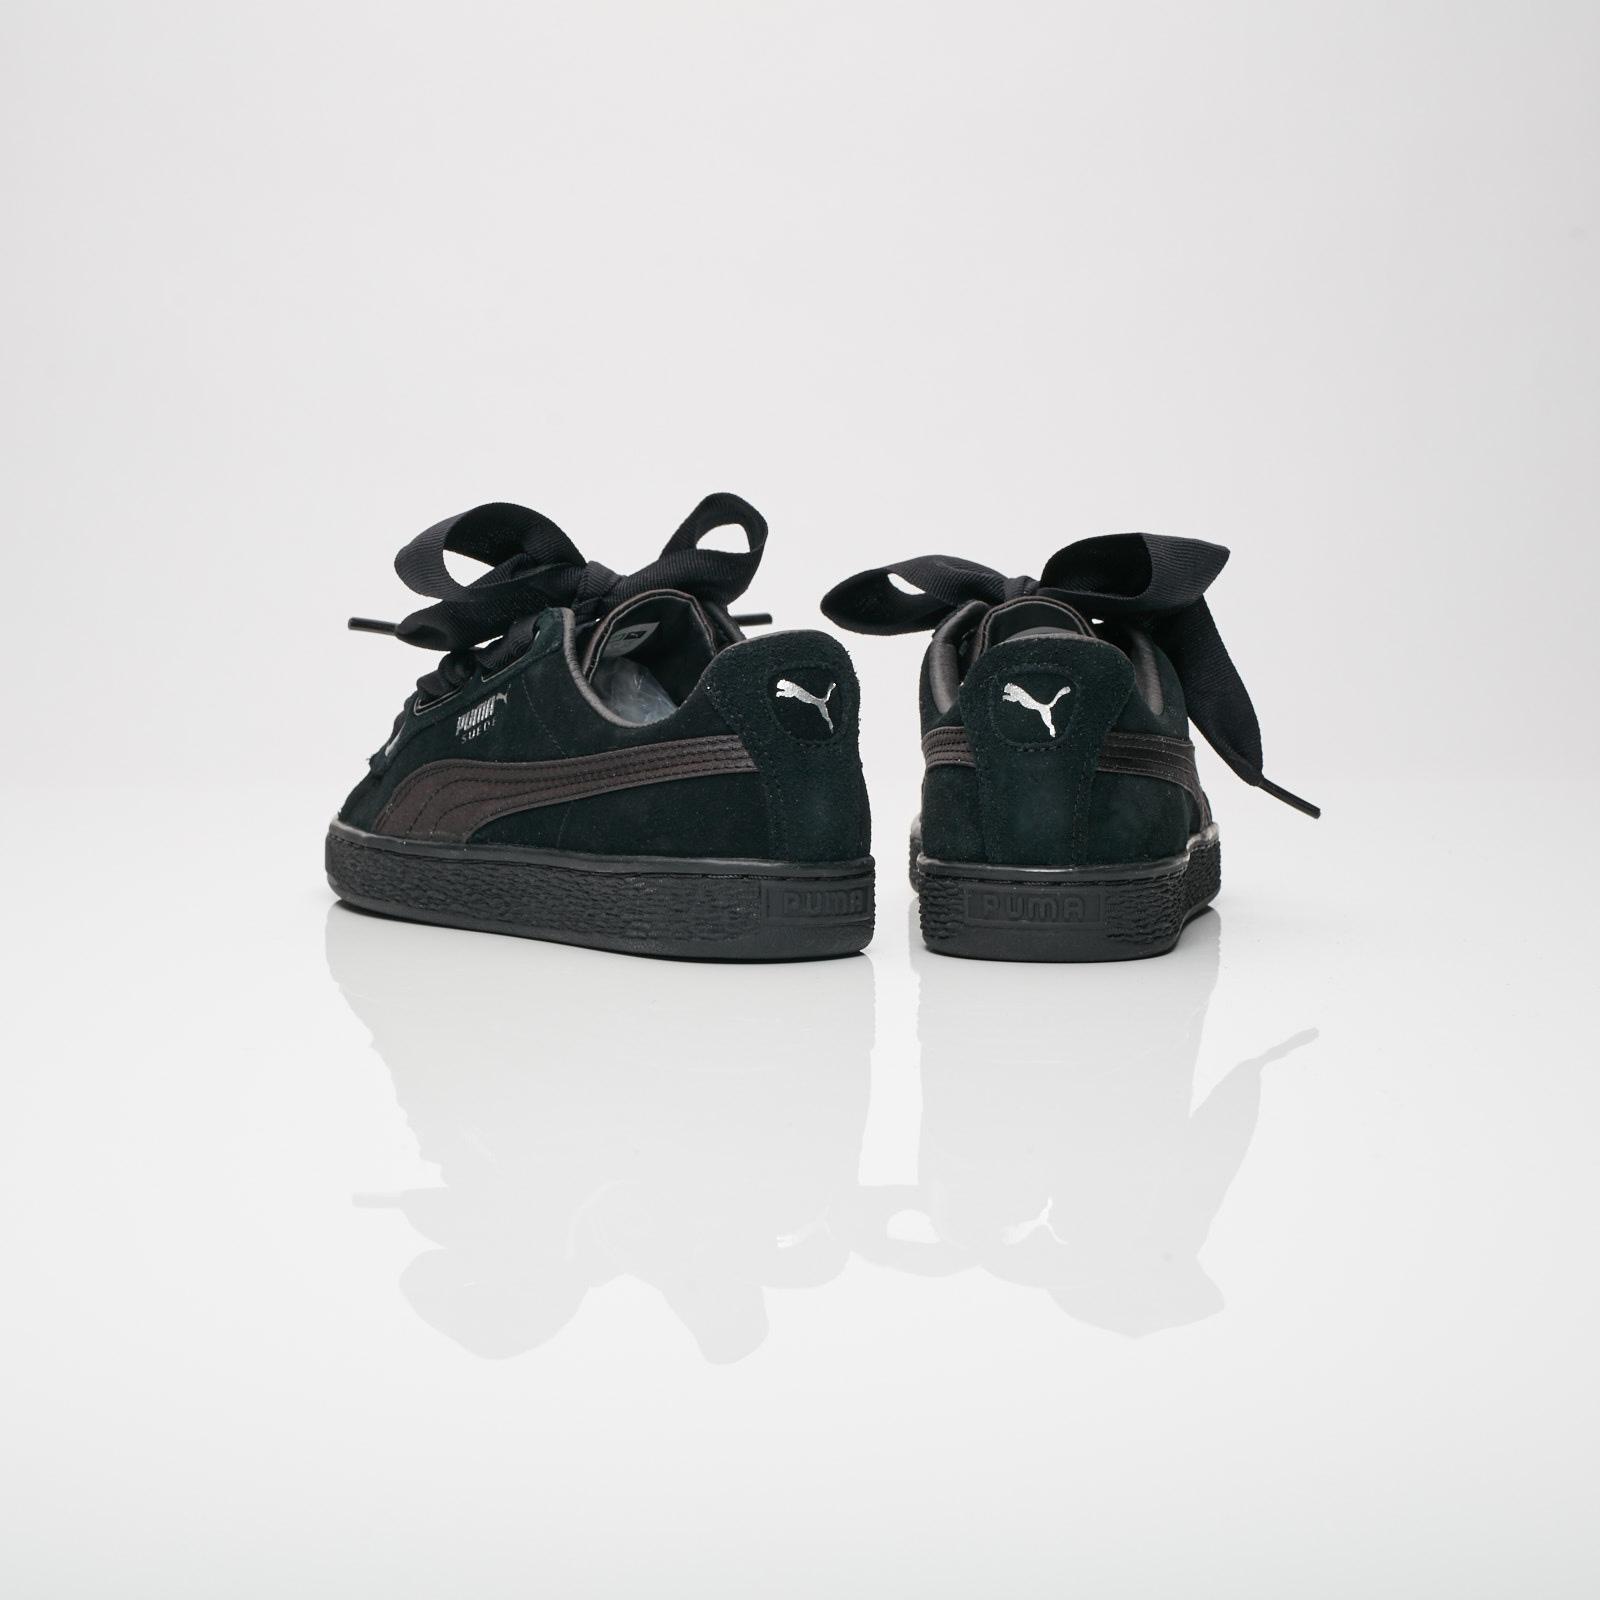 377a8b6f7b7b Puma Suede Heart EP WNS - 366922-01 - Sneakersnstuff